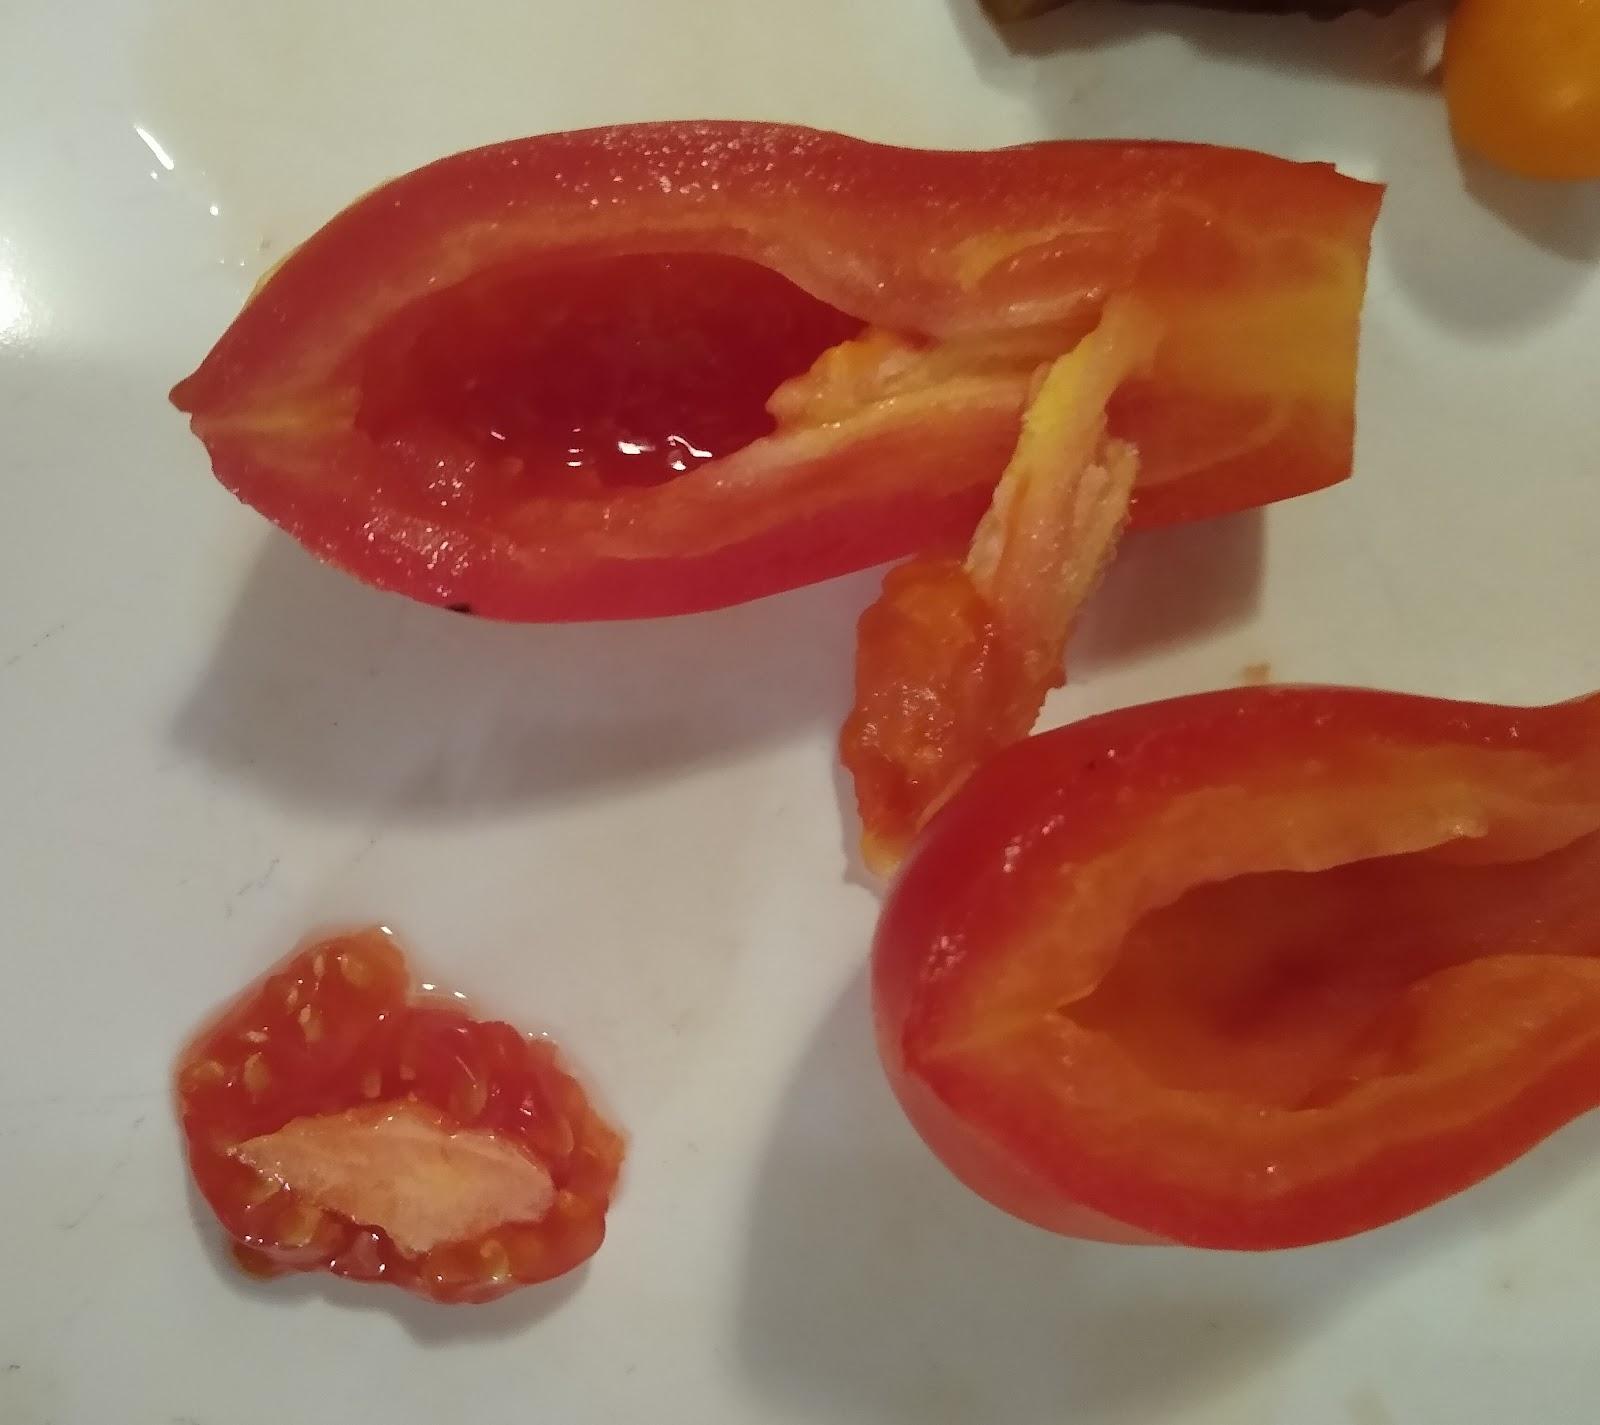 harvesting san marzano tomato seeds picture